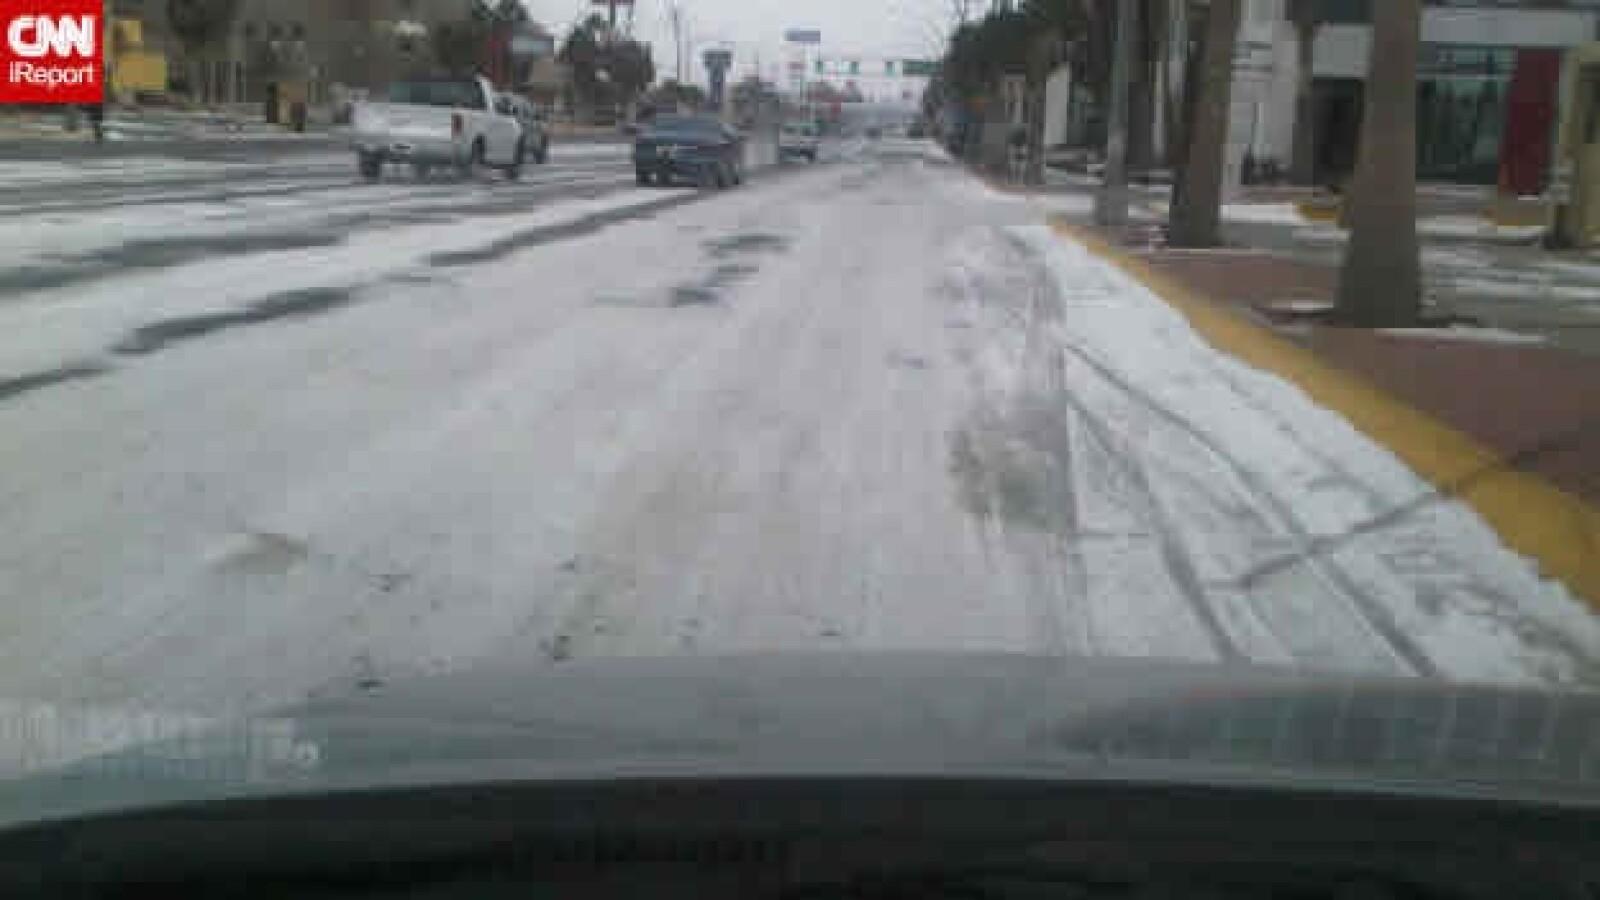 irpt-nevada-juarez